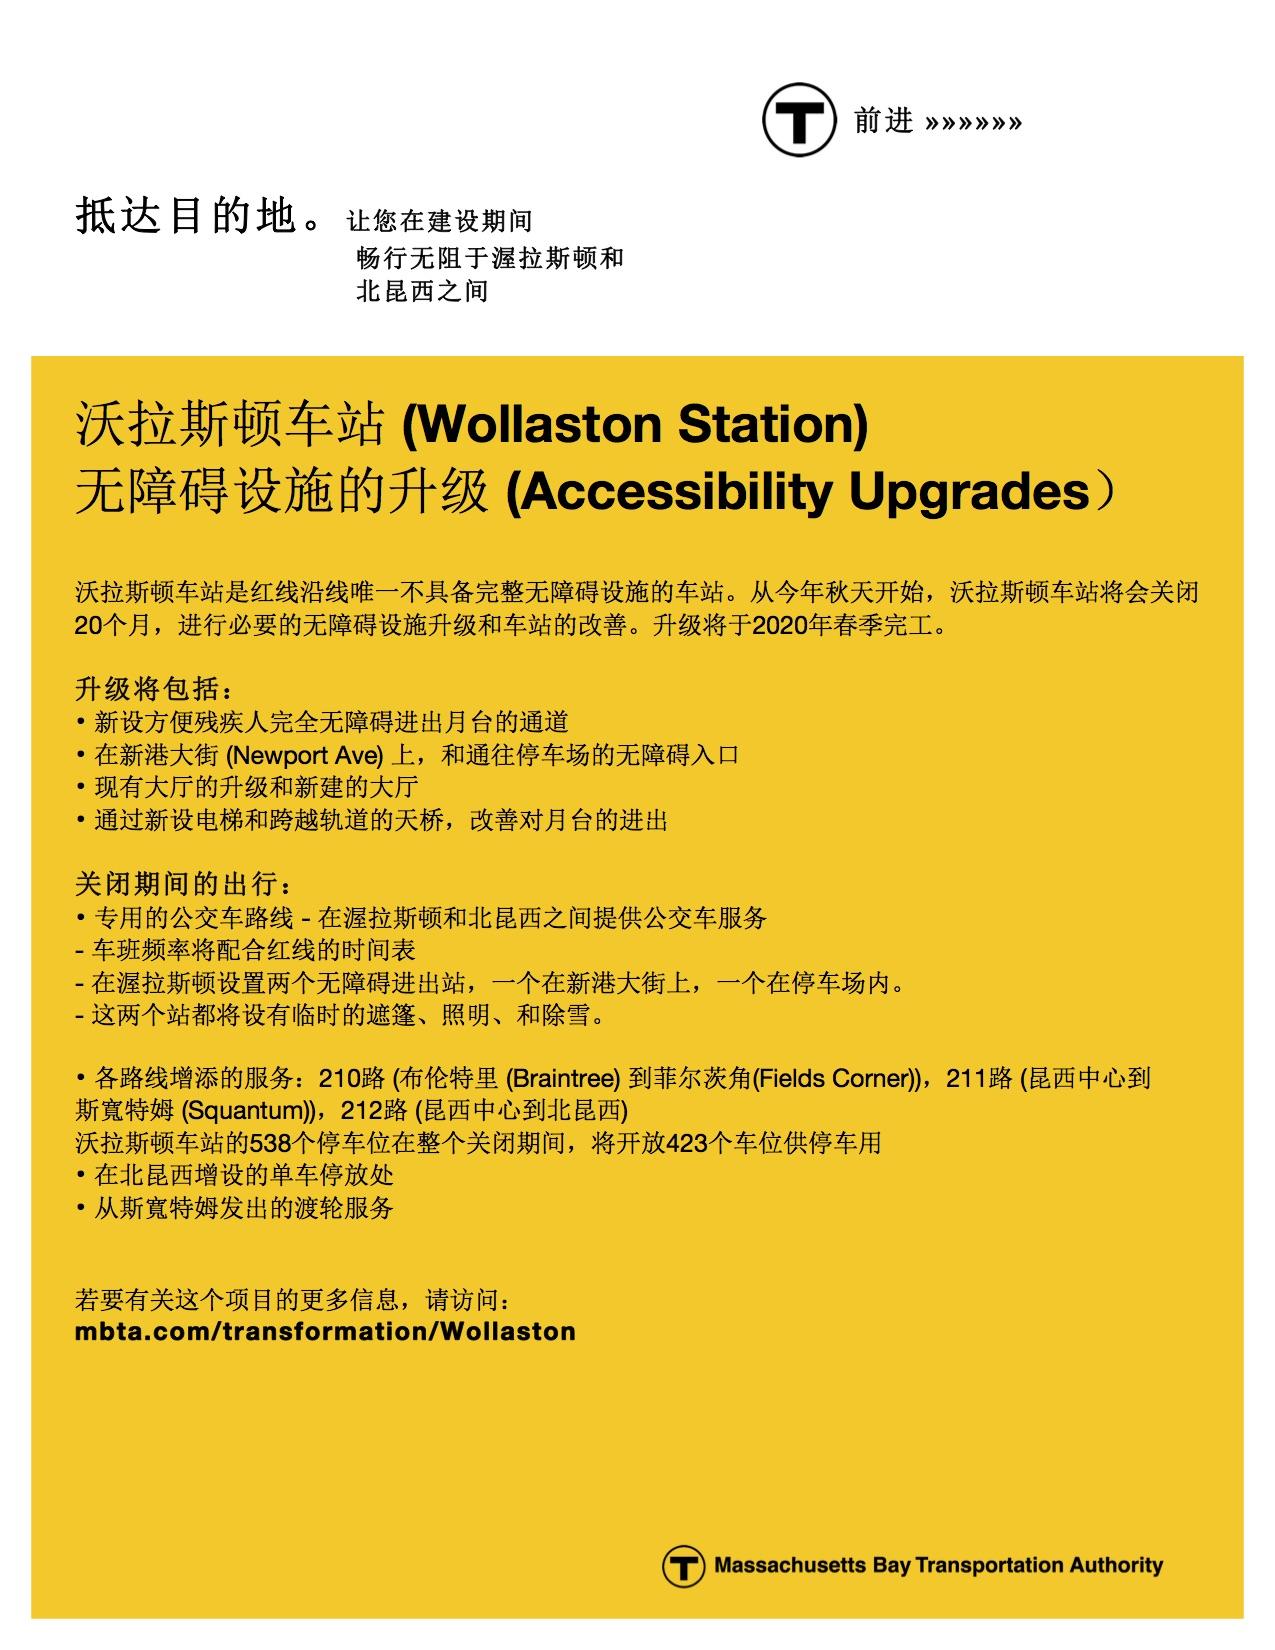 Wollaston Station Upgrades_Chinese S.jpg